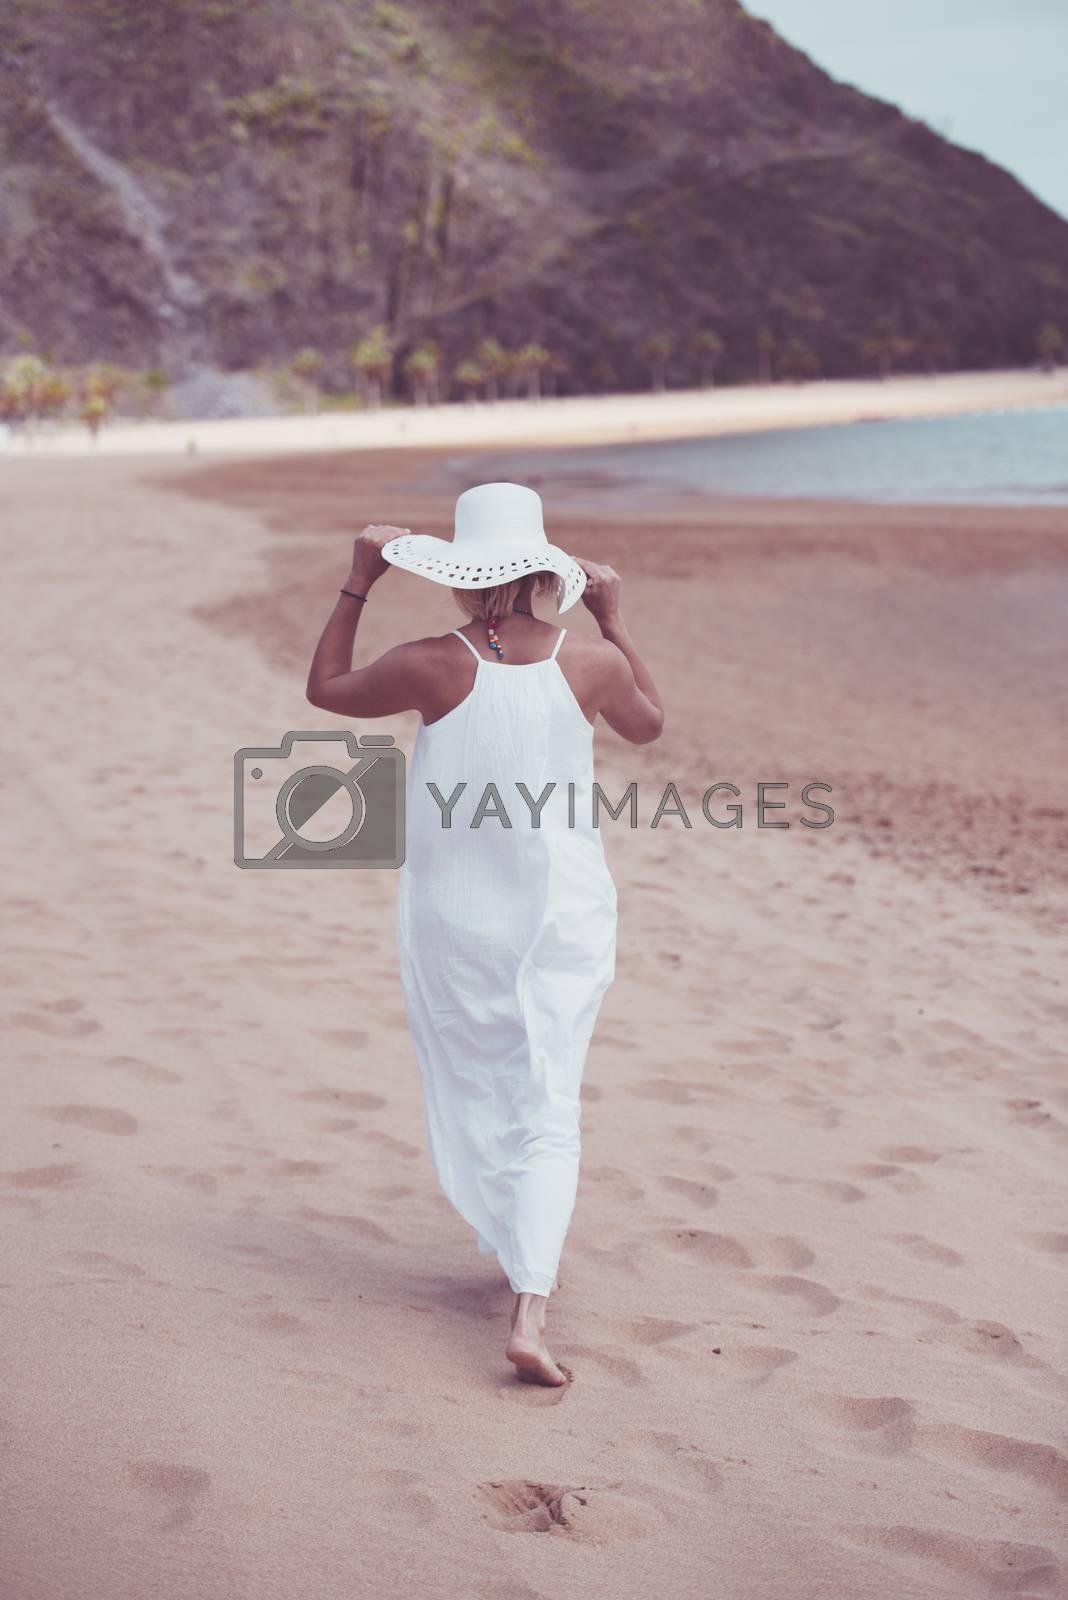 Model in white dress and hat enjoying walk on sandy beach